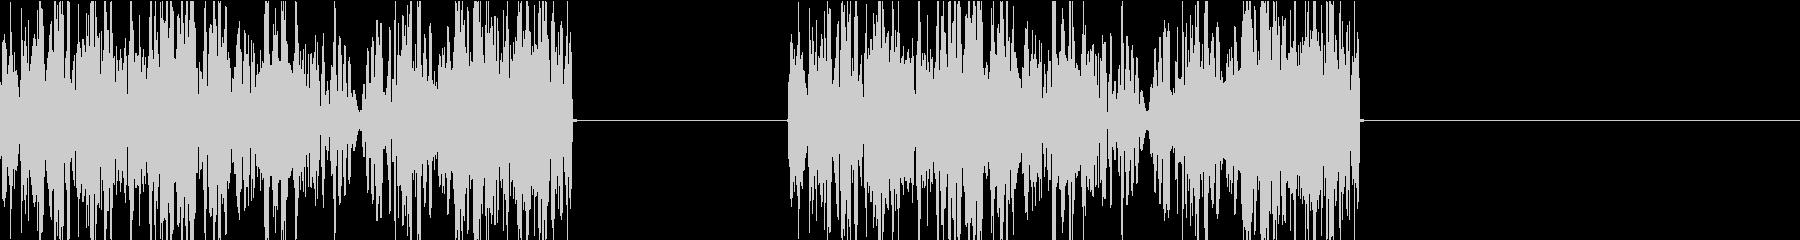 DJプレイ スクラッチ・ノイズ 149の未再生の波形